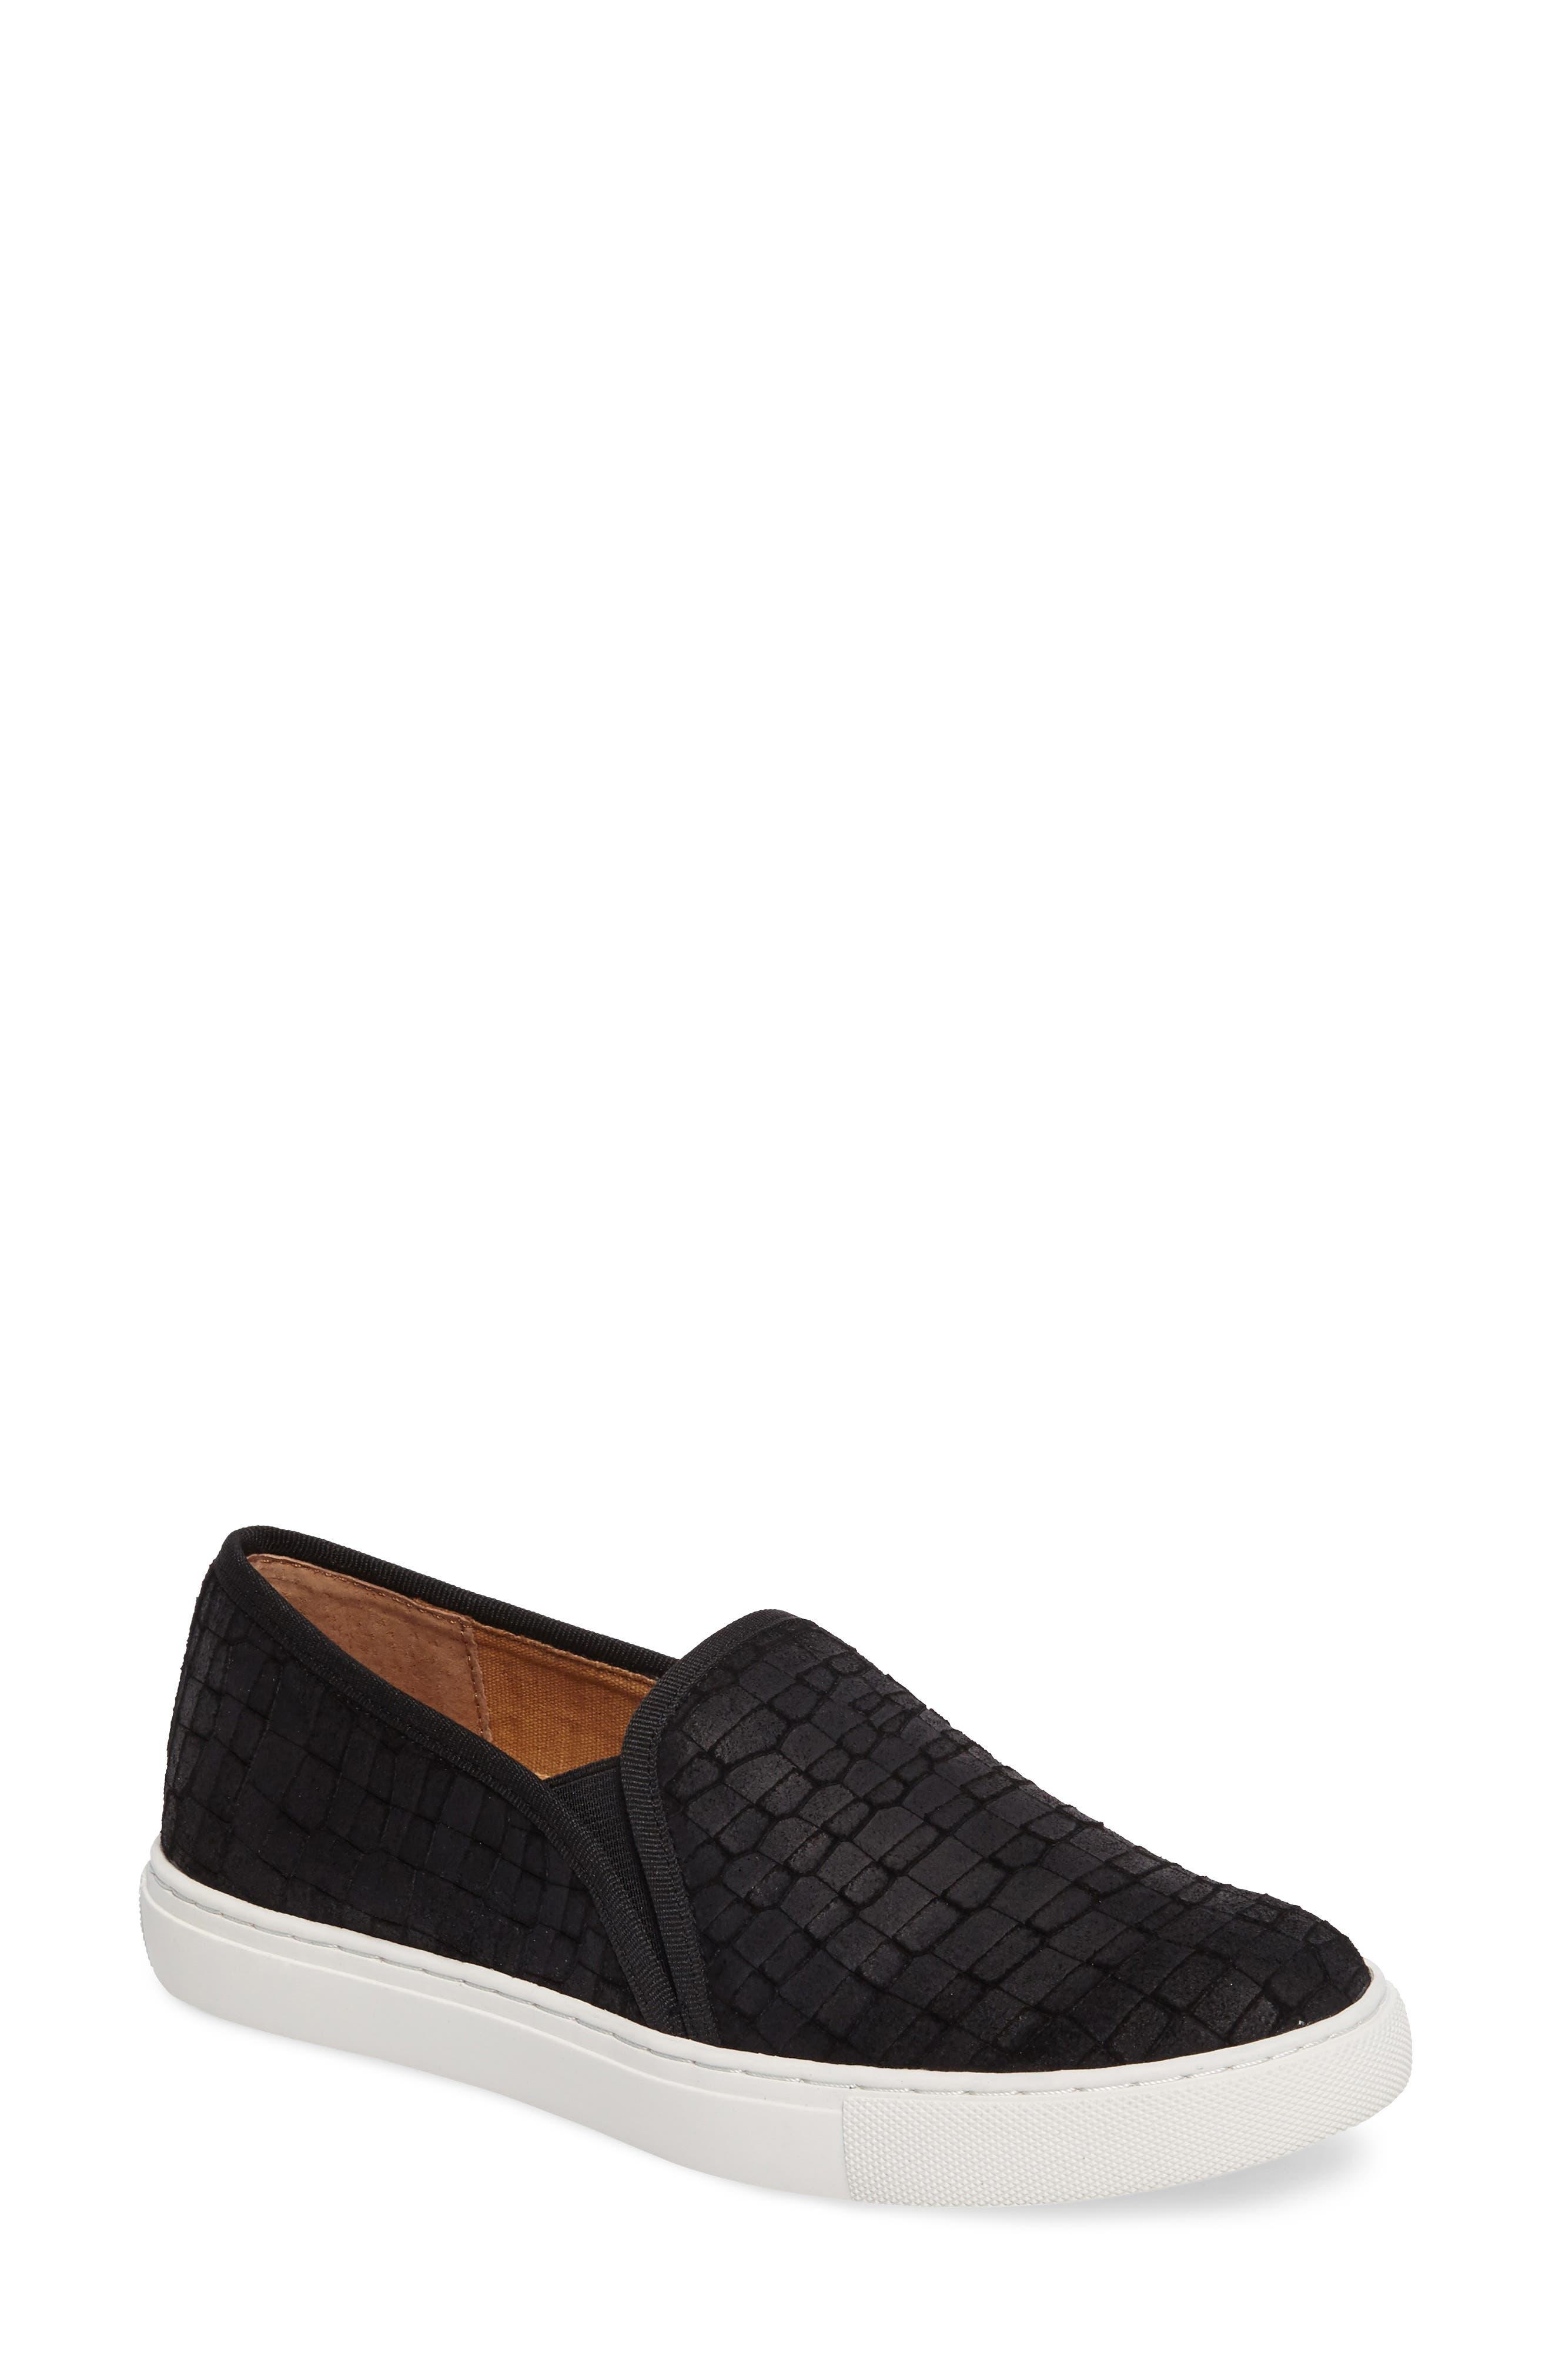 CC Corso Como Skipper Slip-On Sneaker,                             Main thumbnail 1, color,                             002